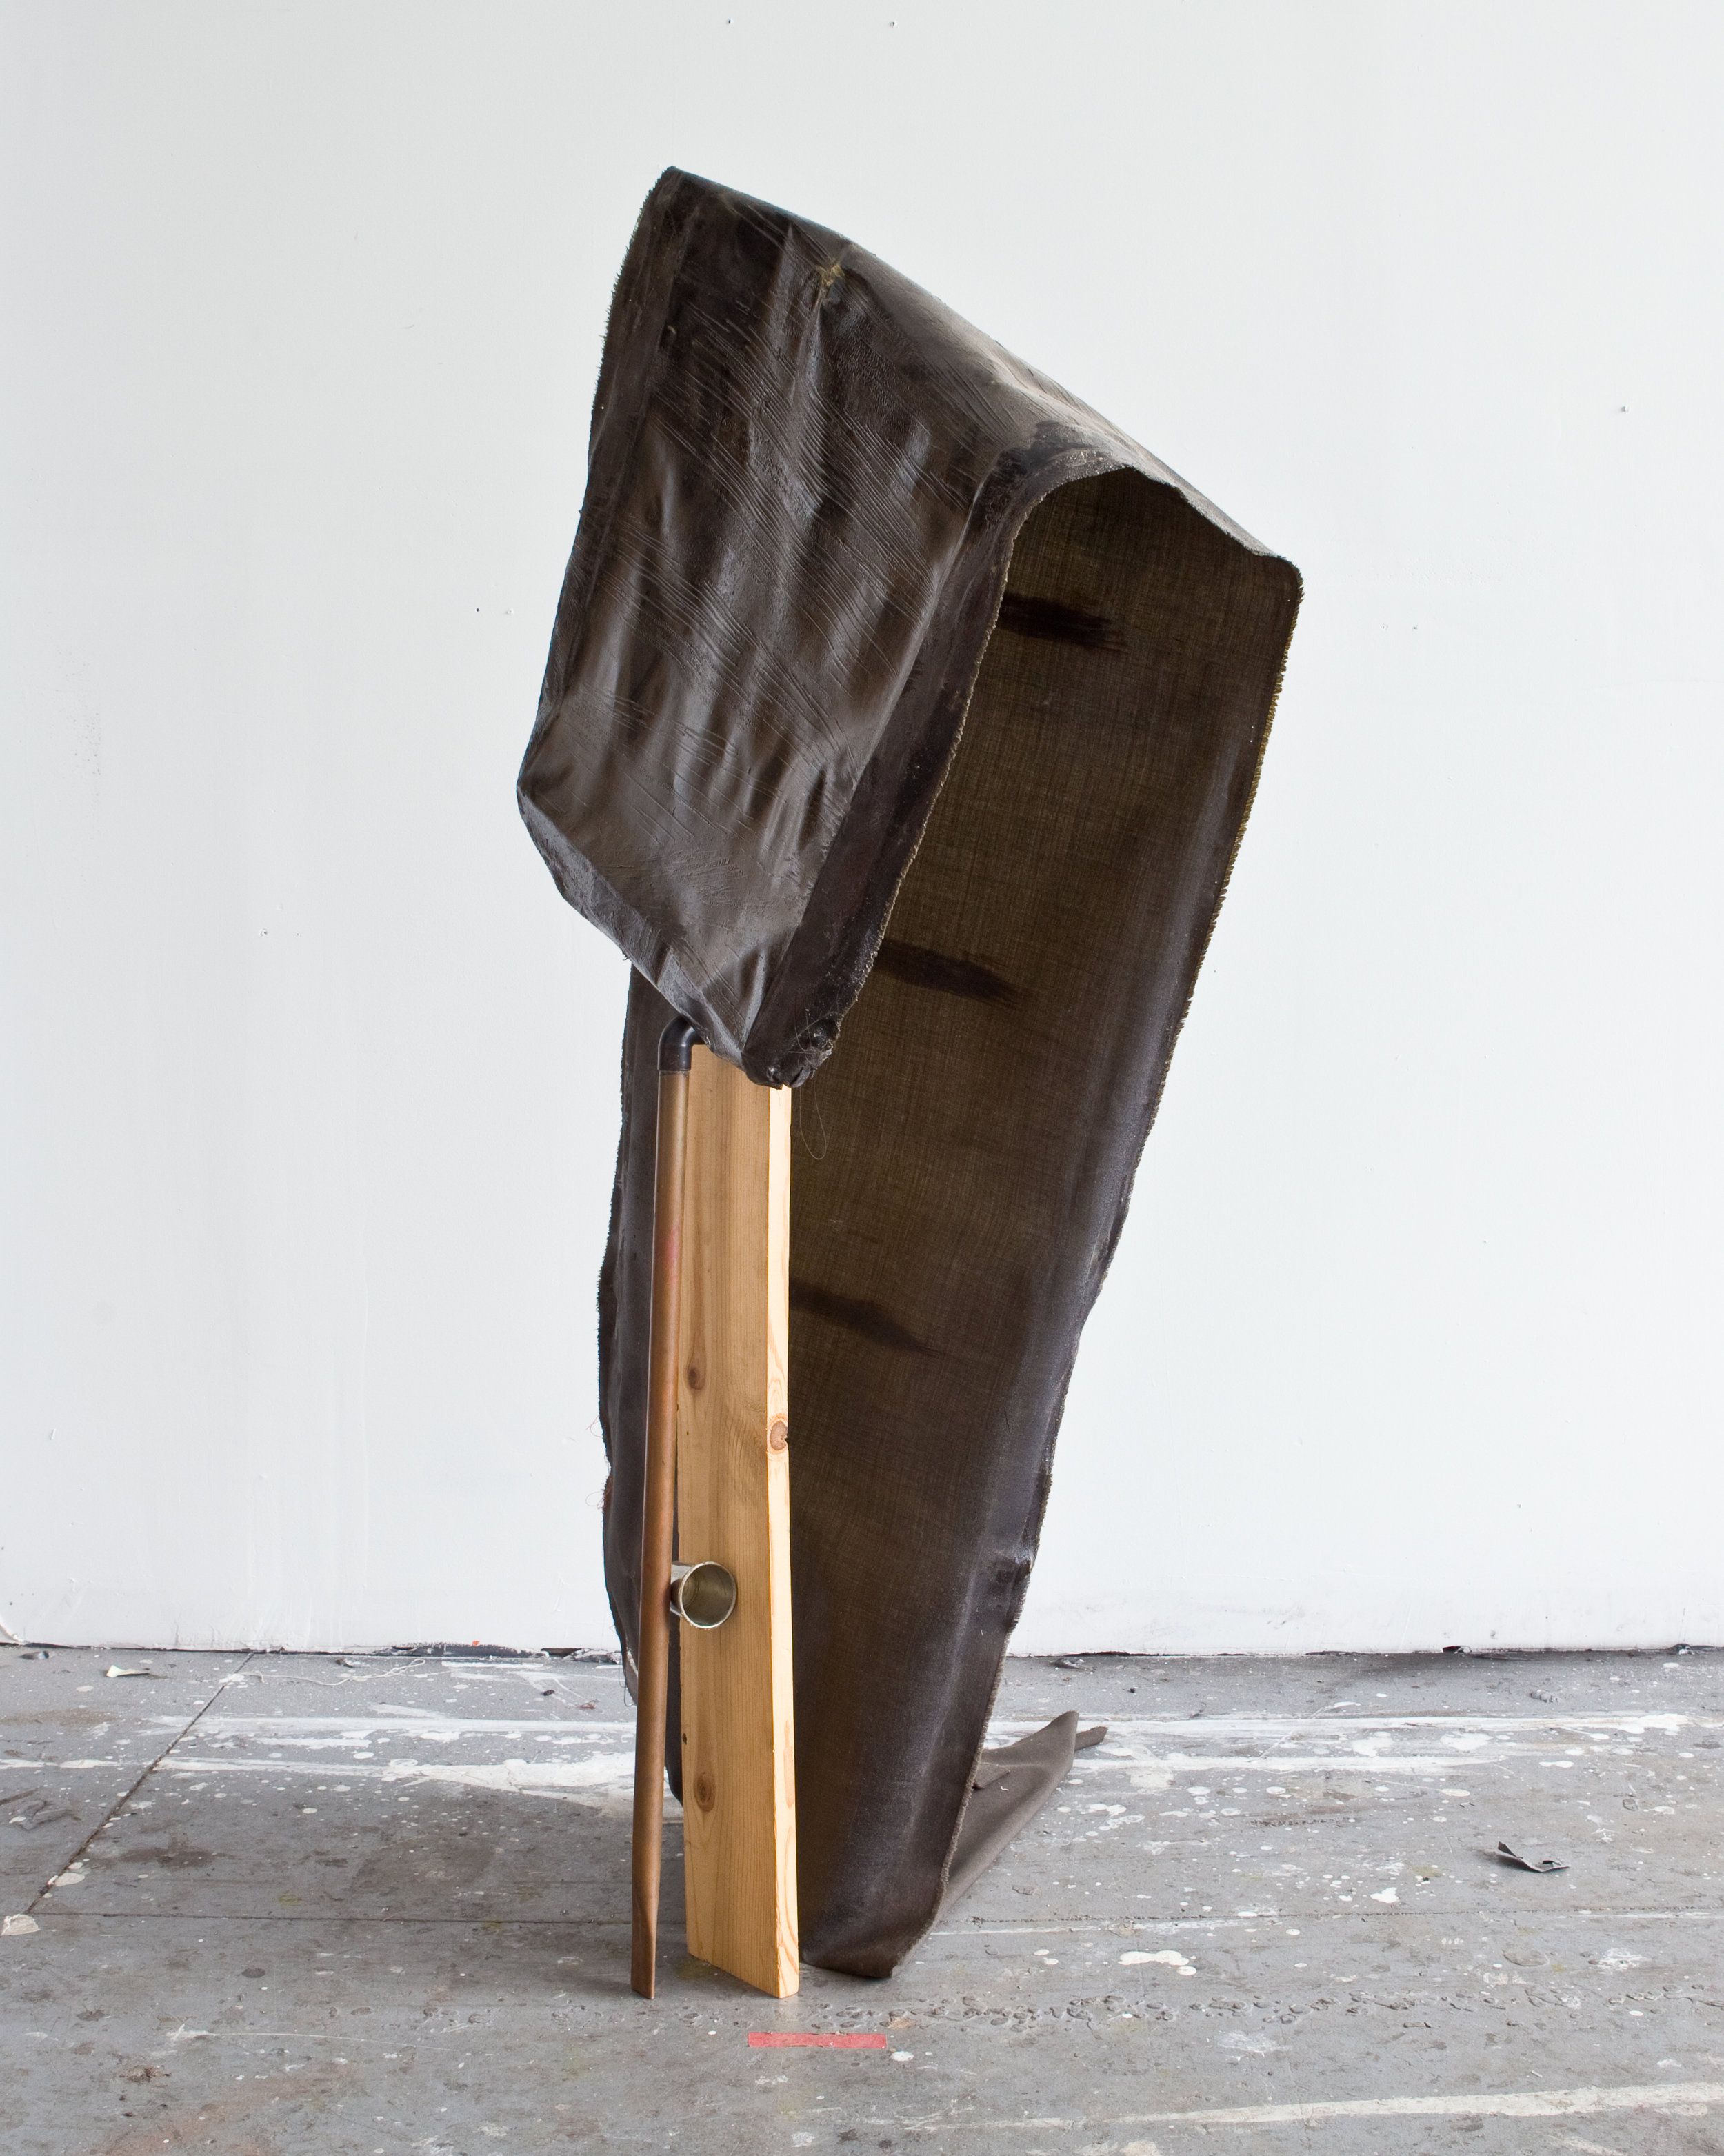 Regenerative Landscape | Fabric, polyurethane, copper, pewter, wood, wood stain, 2017